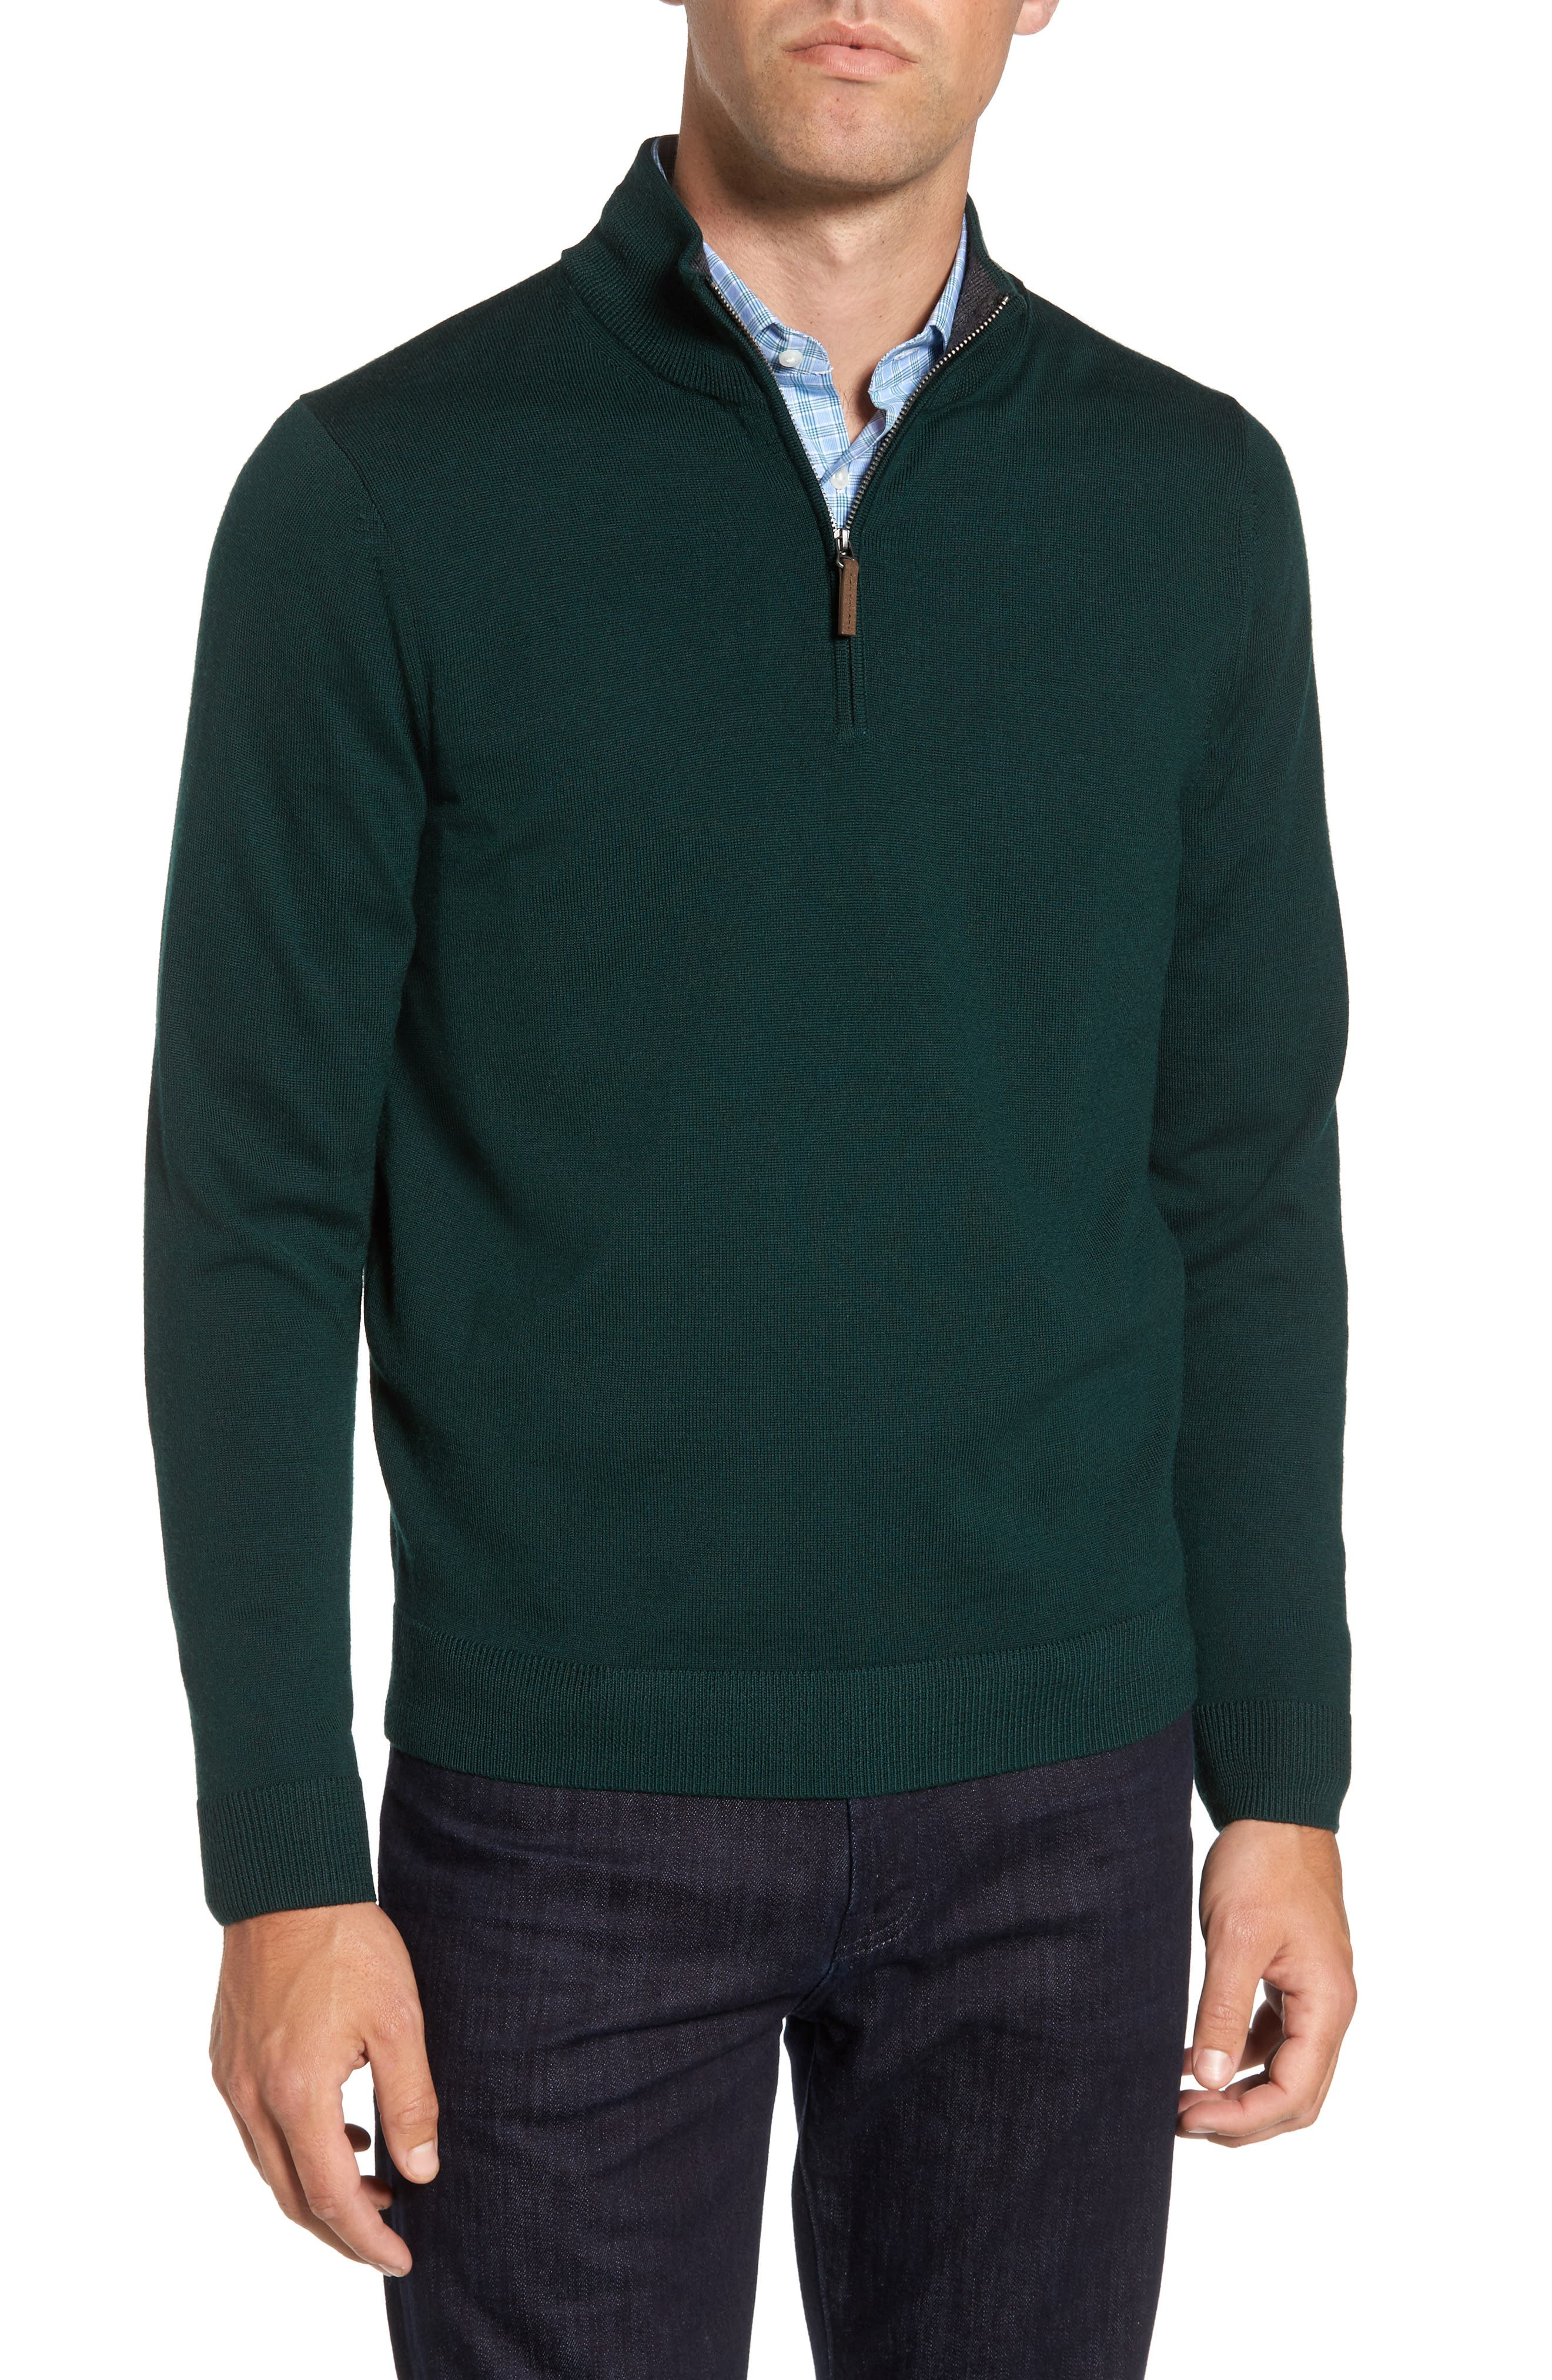 Alternate Image 1 Selected - Nordstrom Men's Shop Quarter Zip Wool Pullover